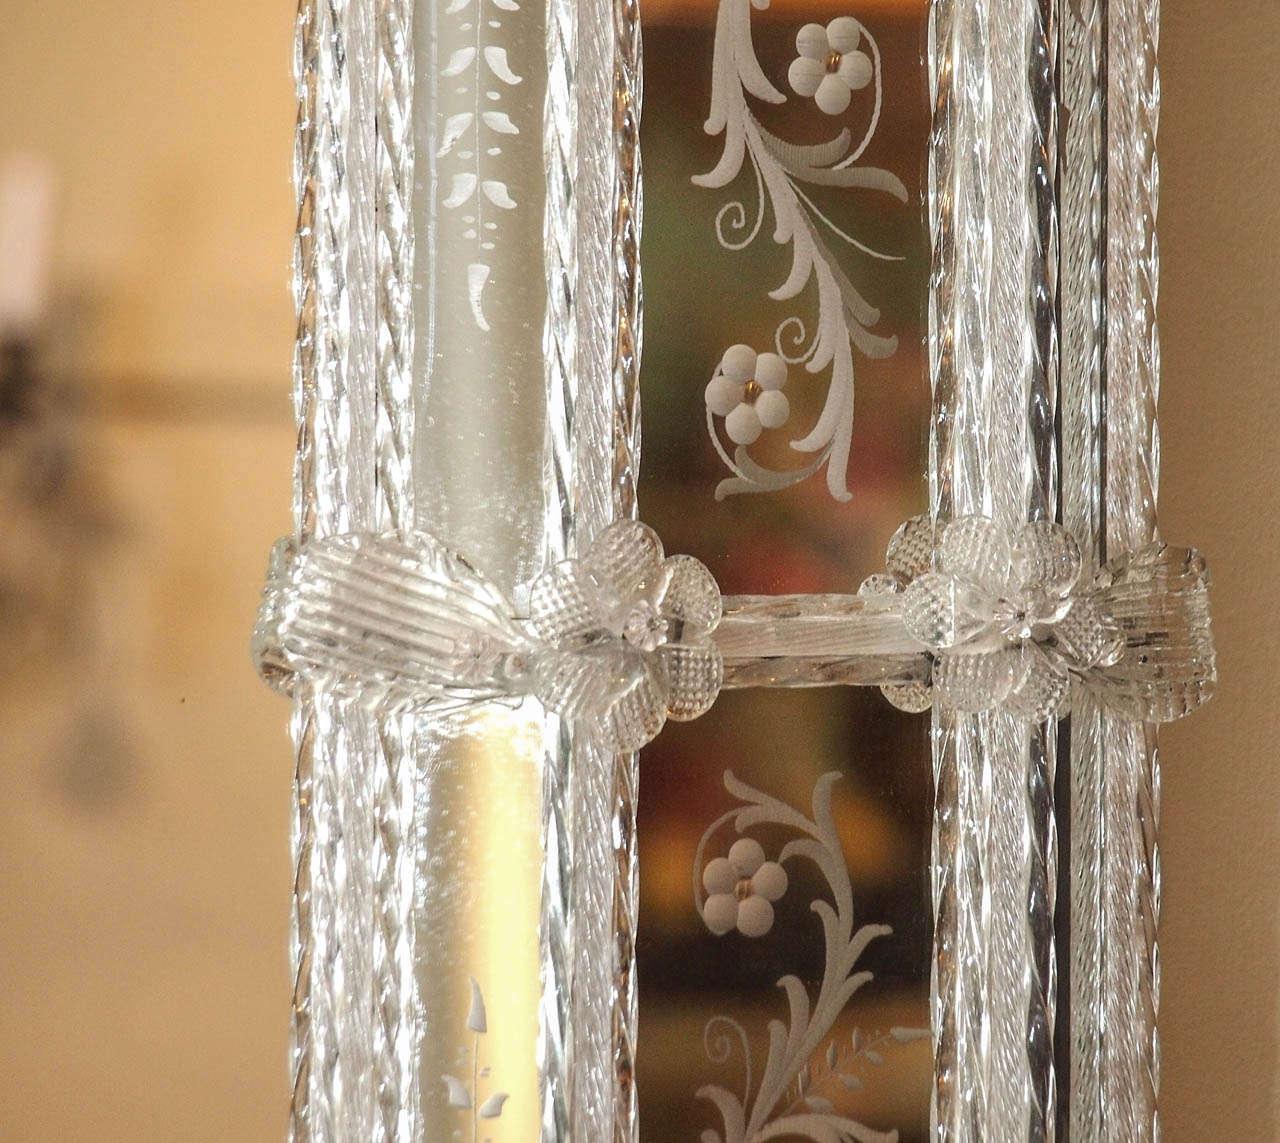 Antique Venetian Mirror circa 1920s-1930s 5